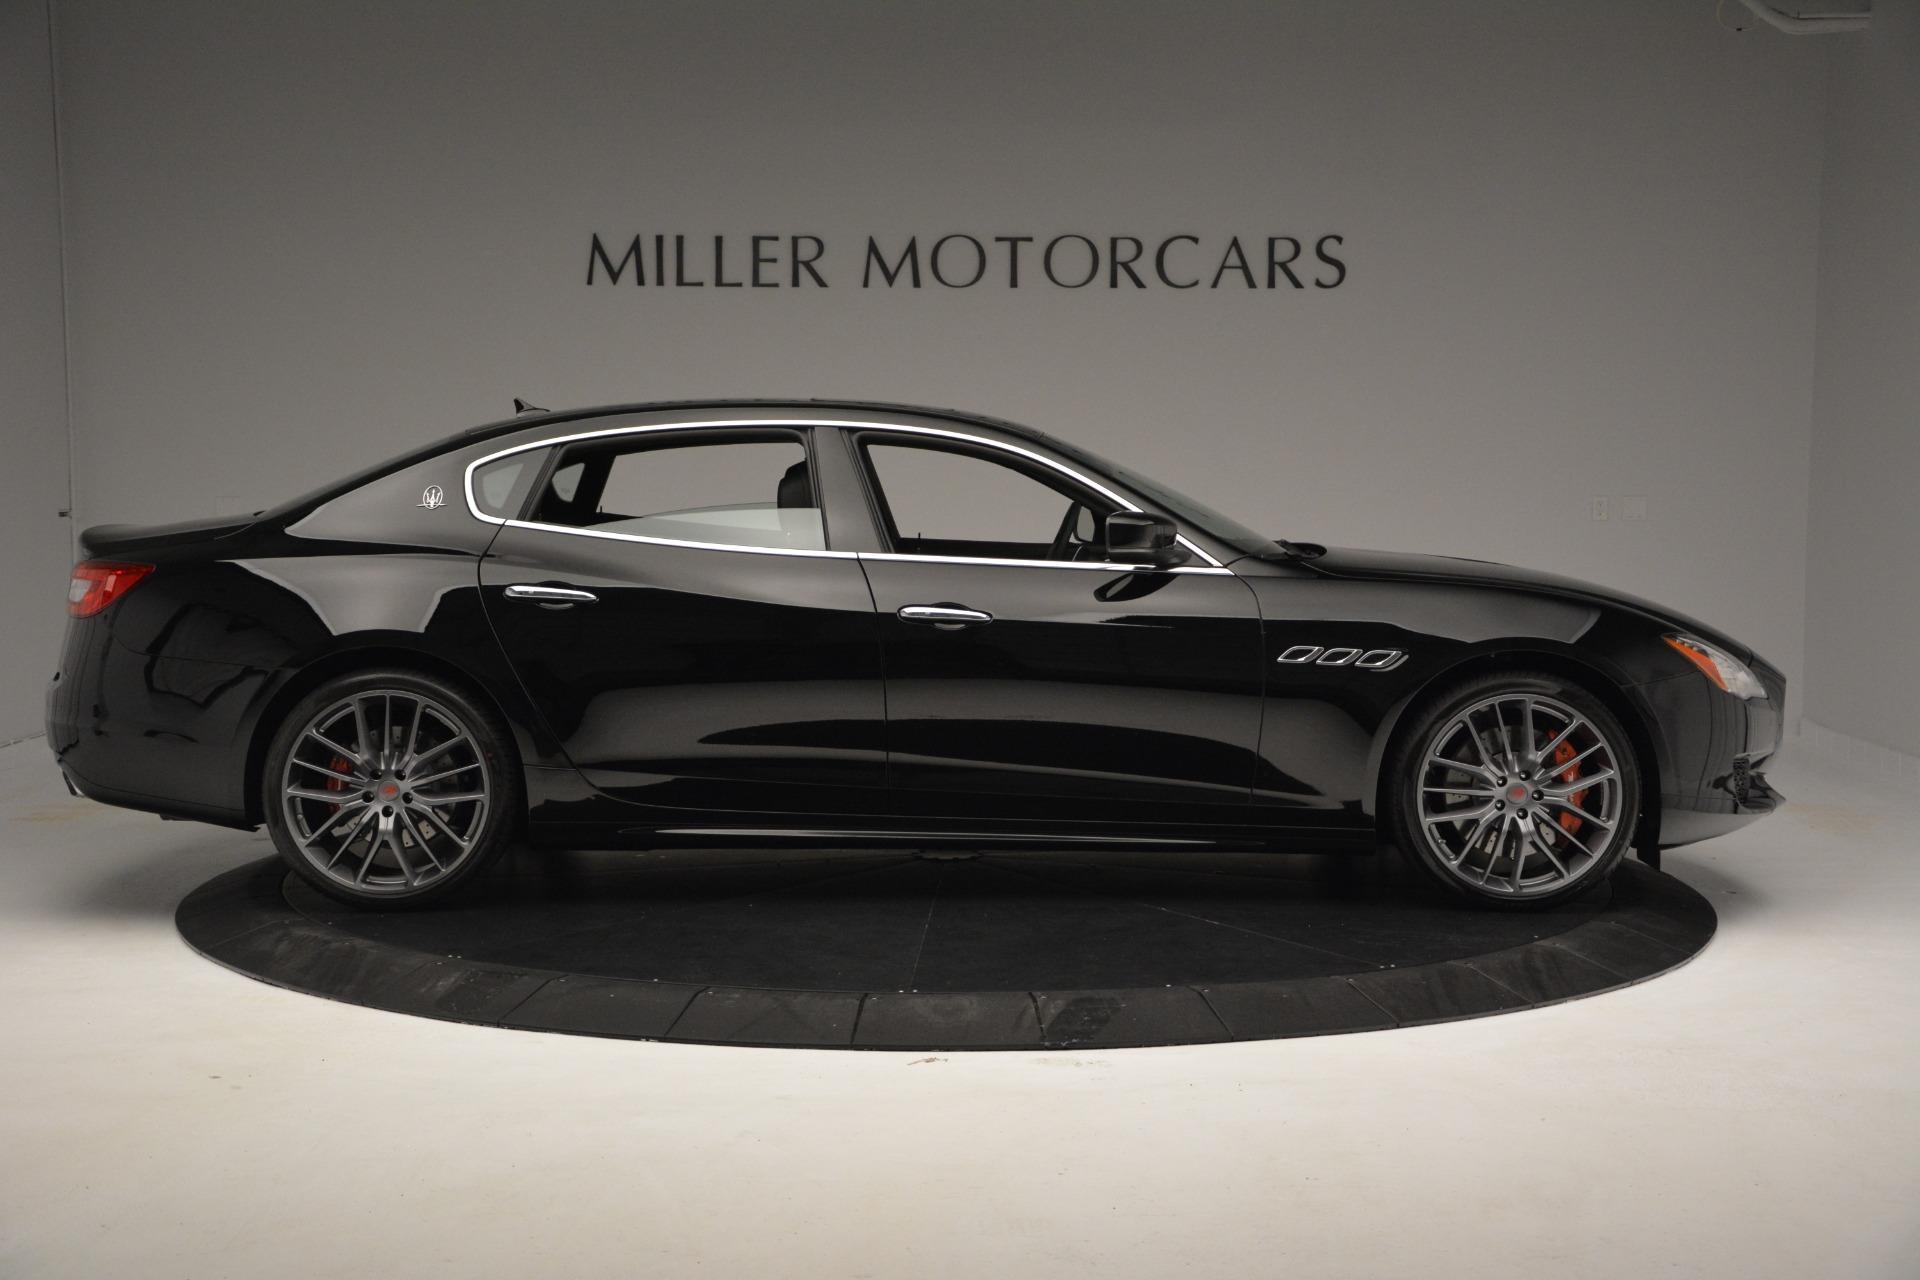 Used 2015 Maserati Quattroporte GTS For Sale In Westport, CT 2993_p9